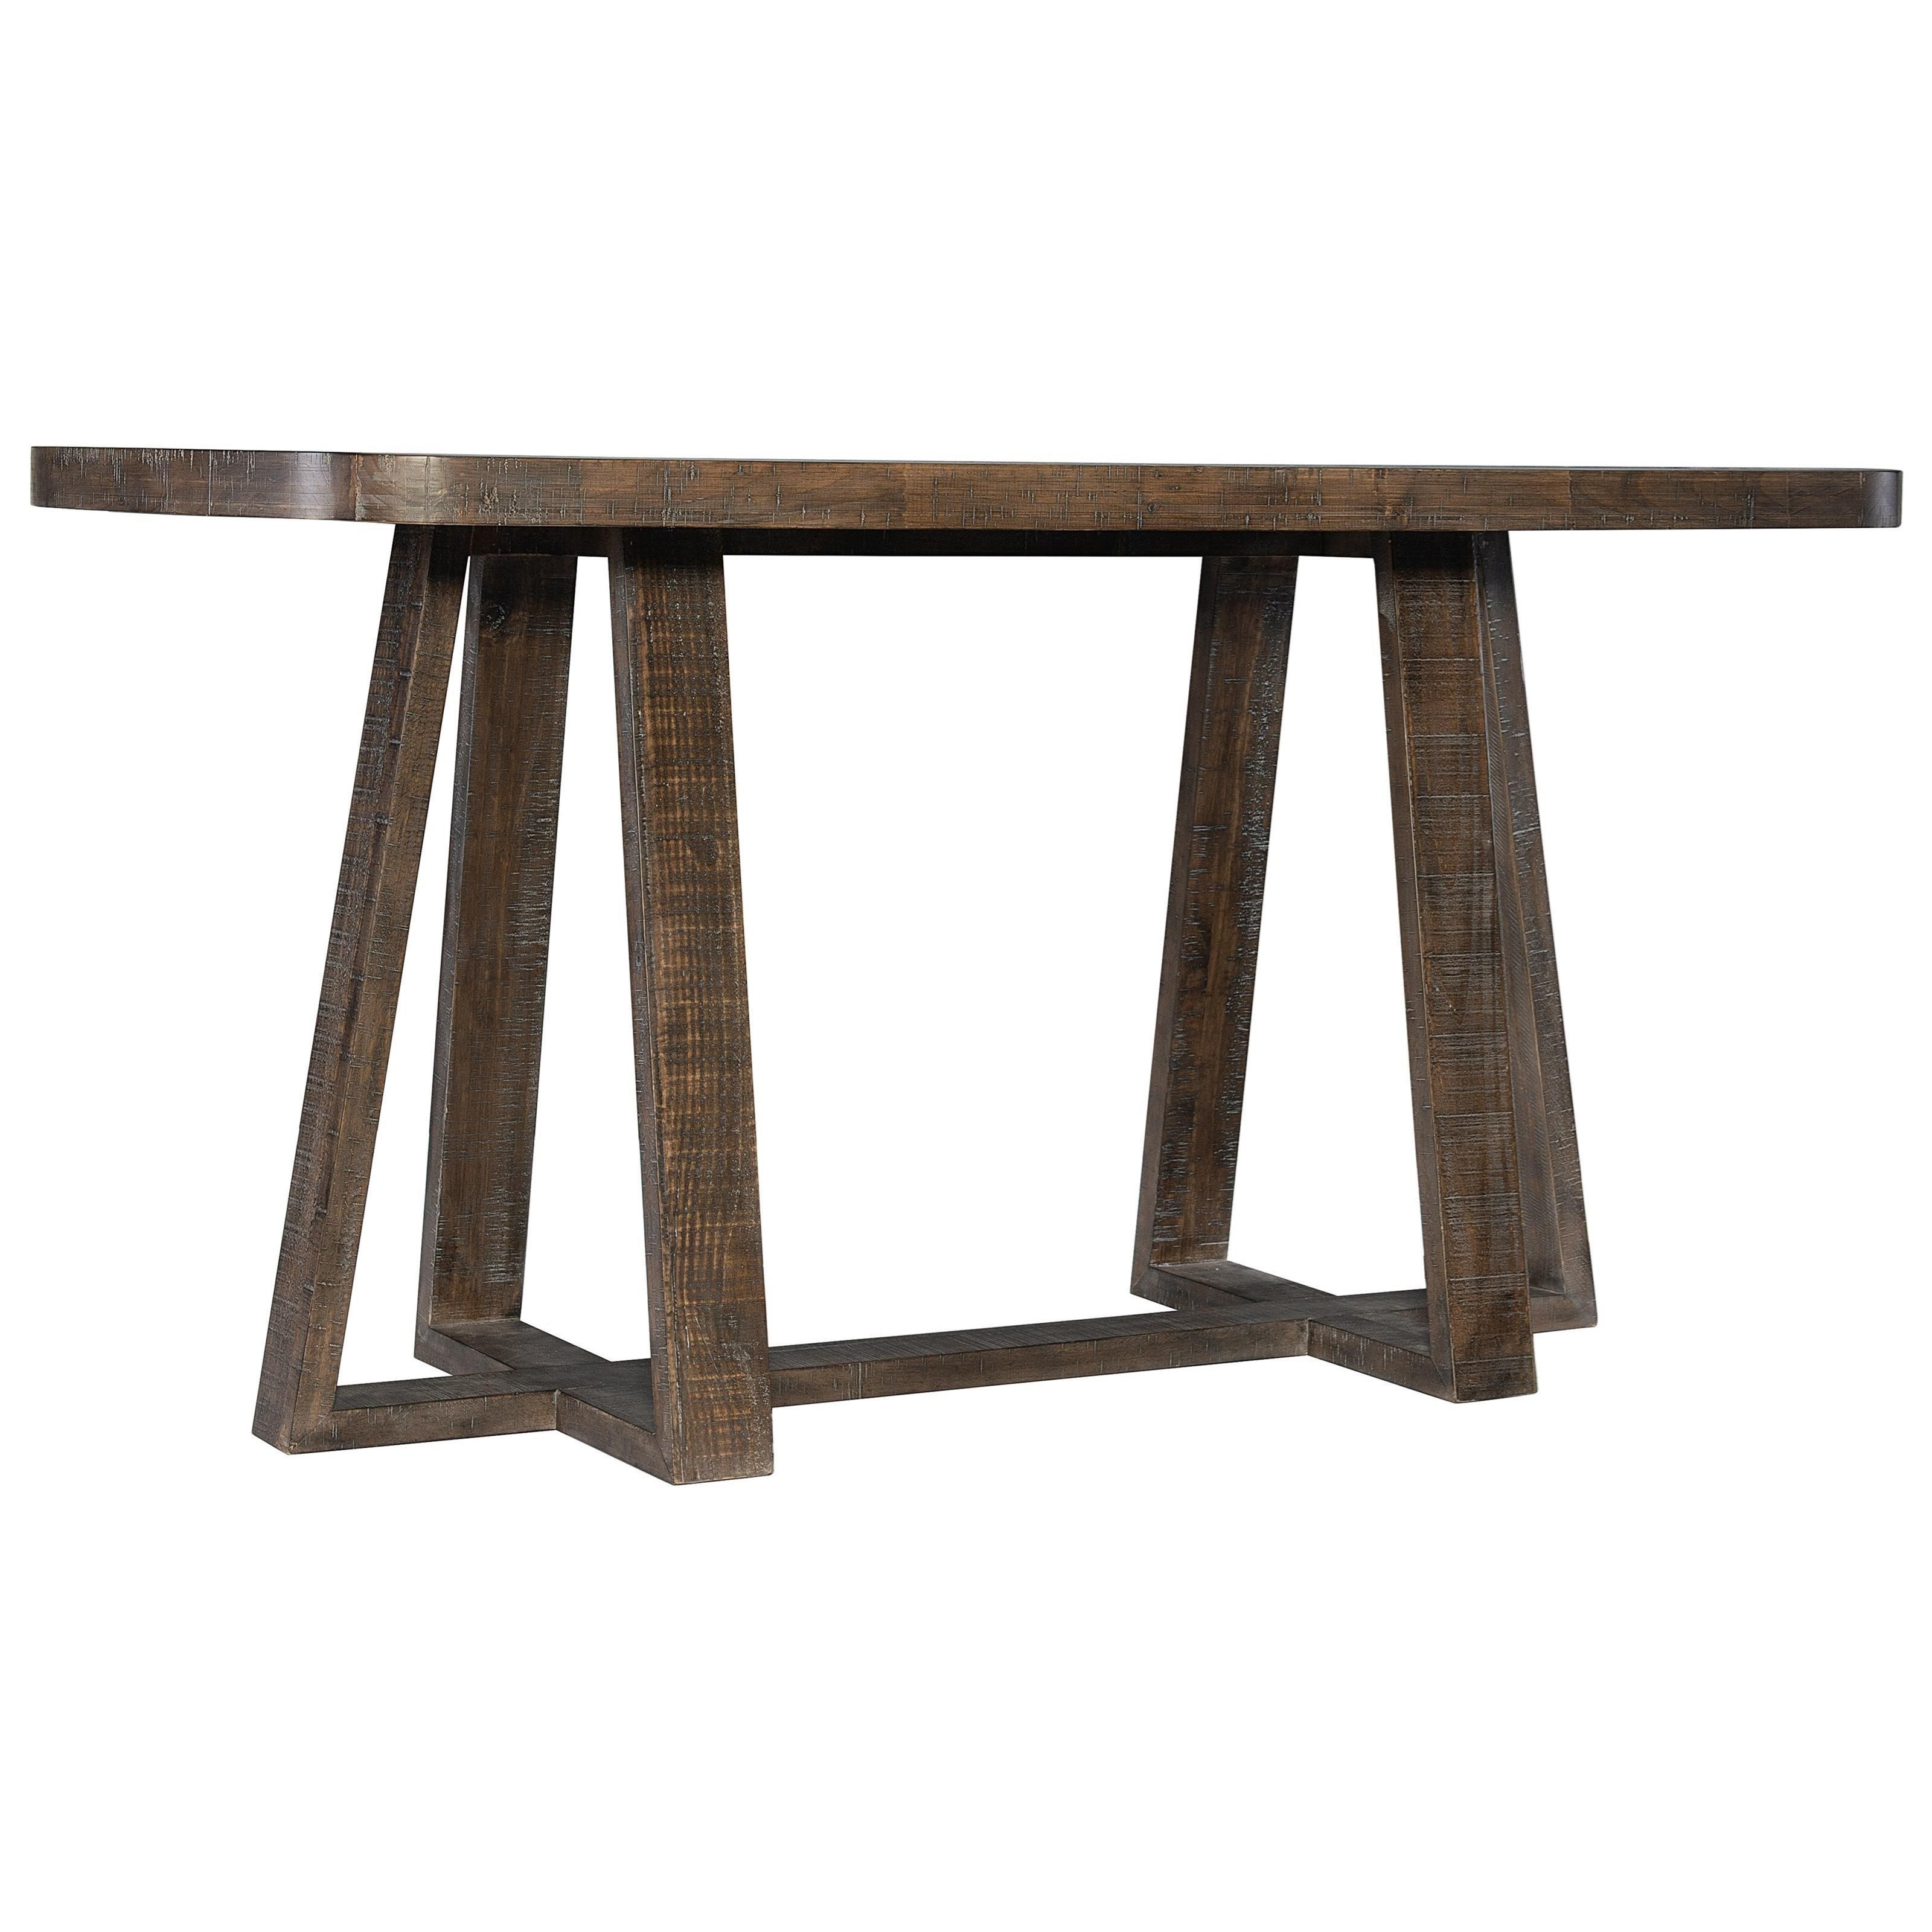 Loft - Logan Square Asher Gathering Table by Bernhardt at Baer's Furniture